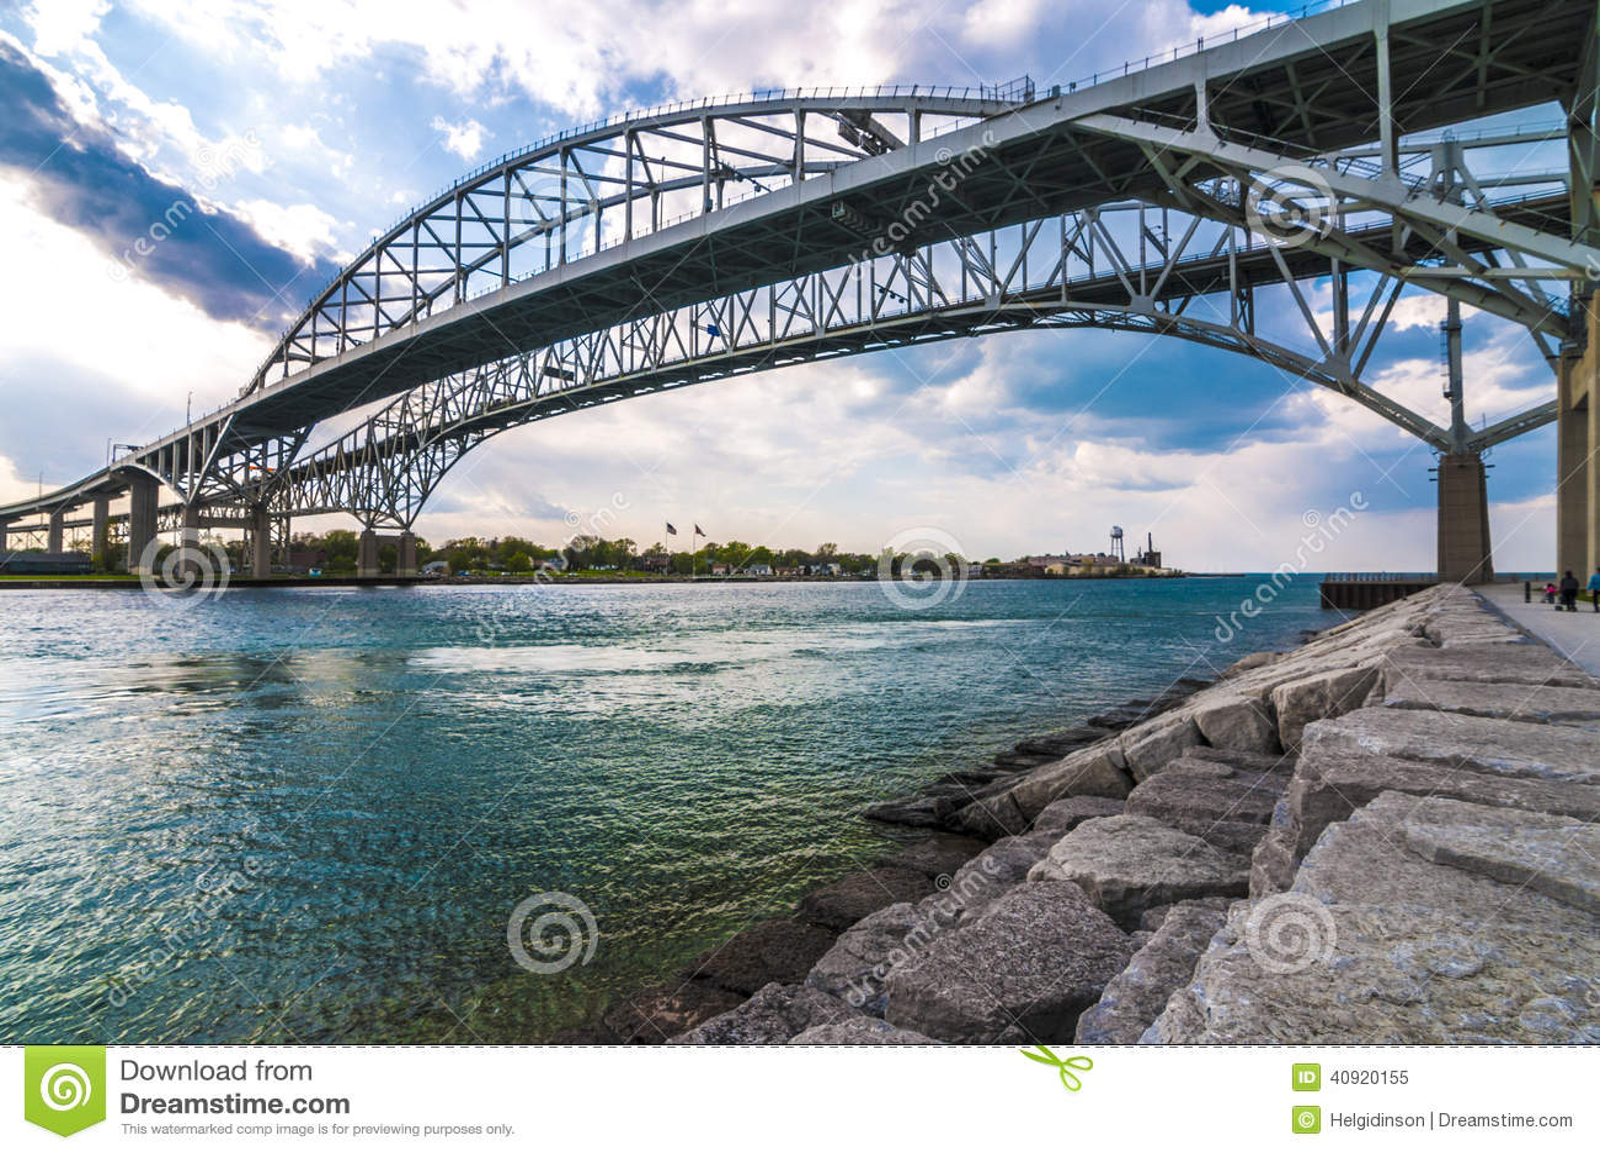 Sarnia (ON) Canada  city images : ... Crossing Bridge, Sarnia Ontario Canada Stock Photo Image: 40920155